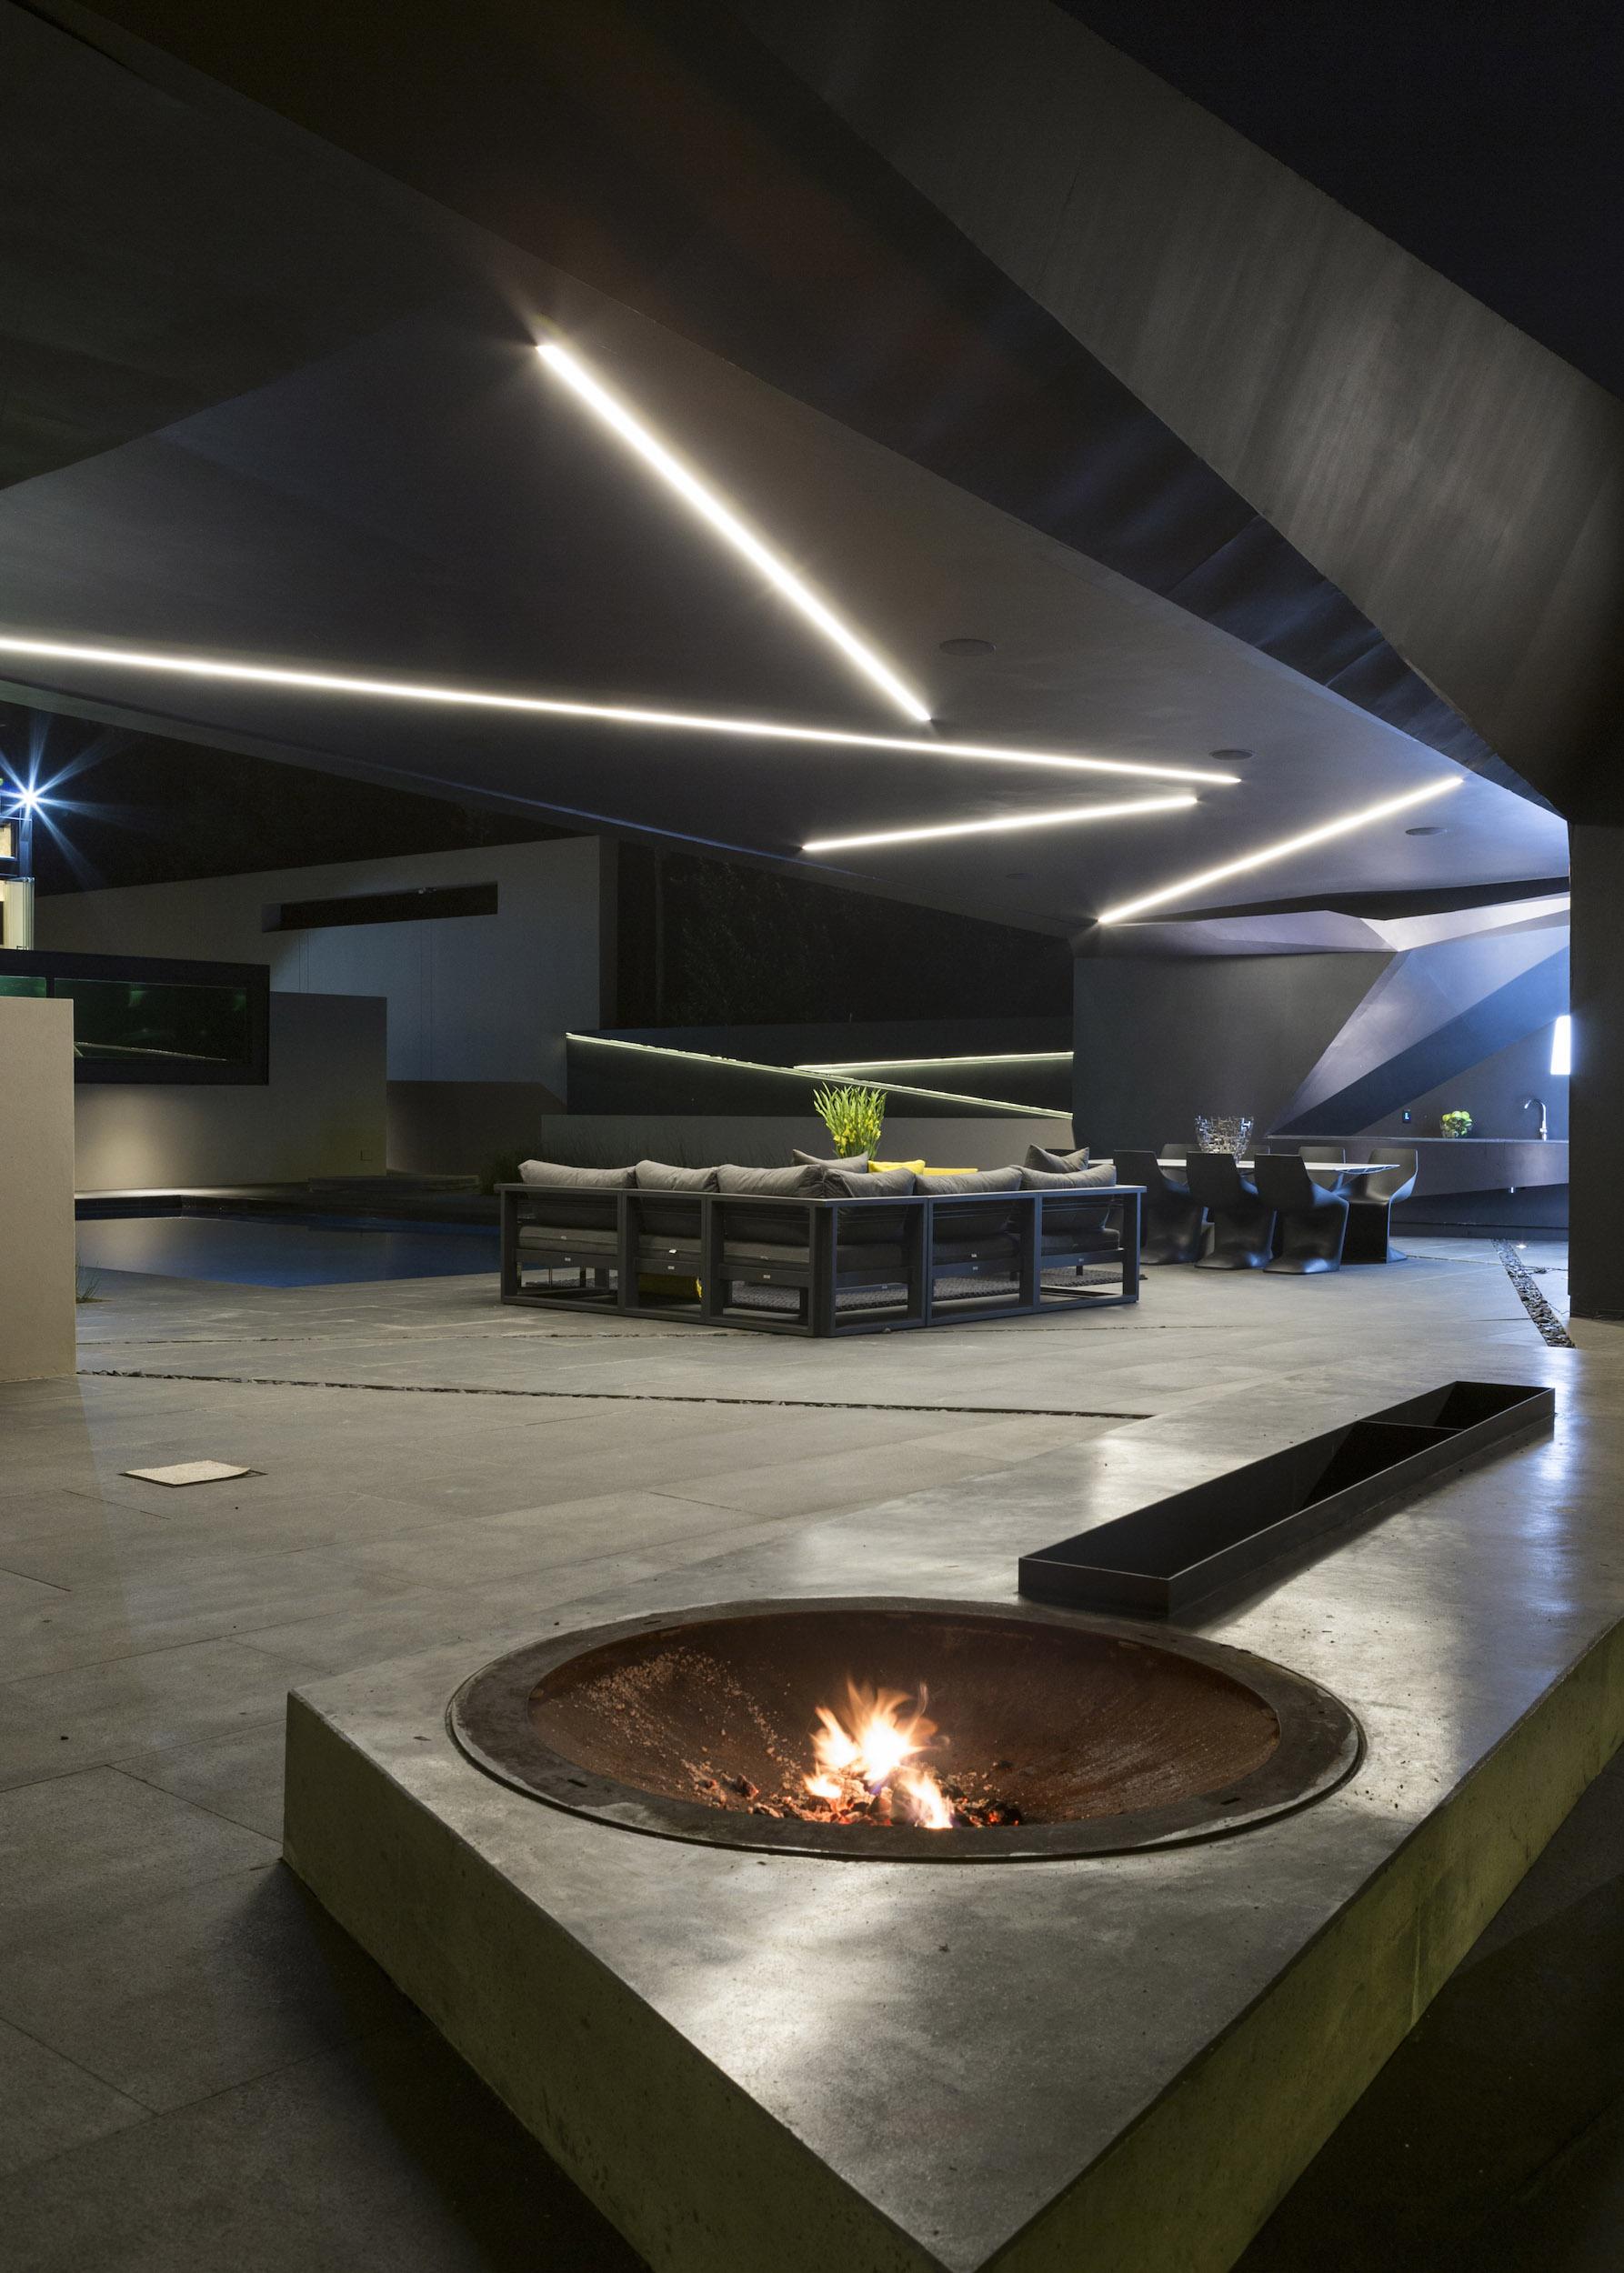 Kloof Road Masterpiece House in Johannesburg by Nico van der Meulen Architects-12